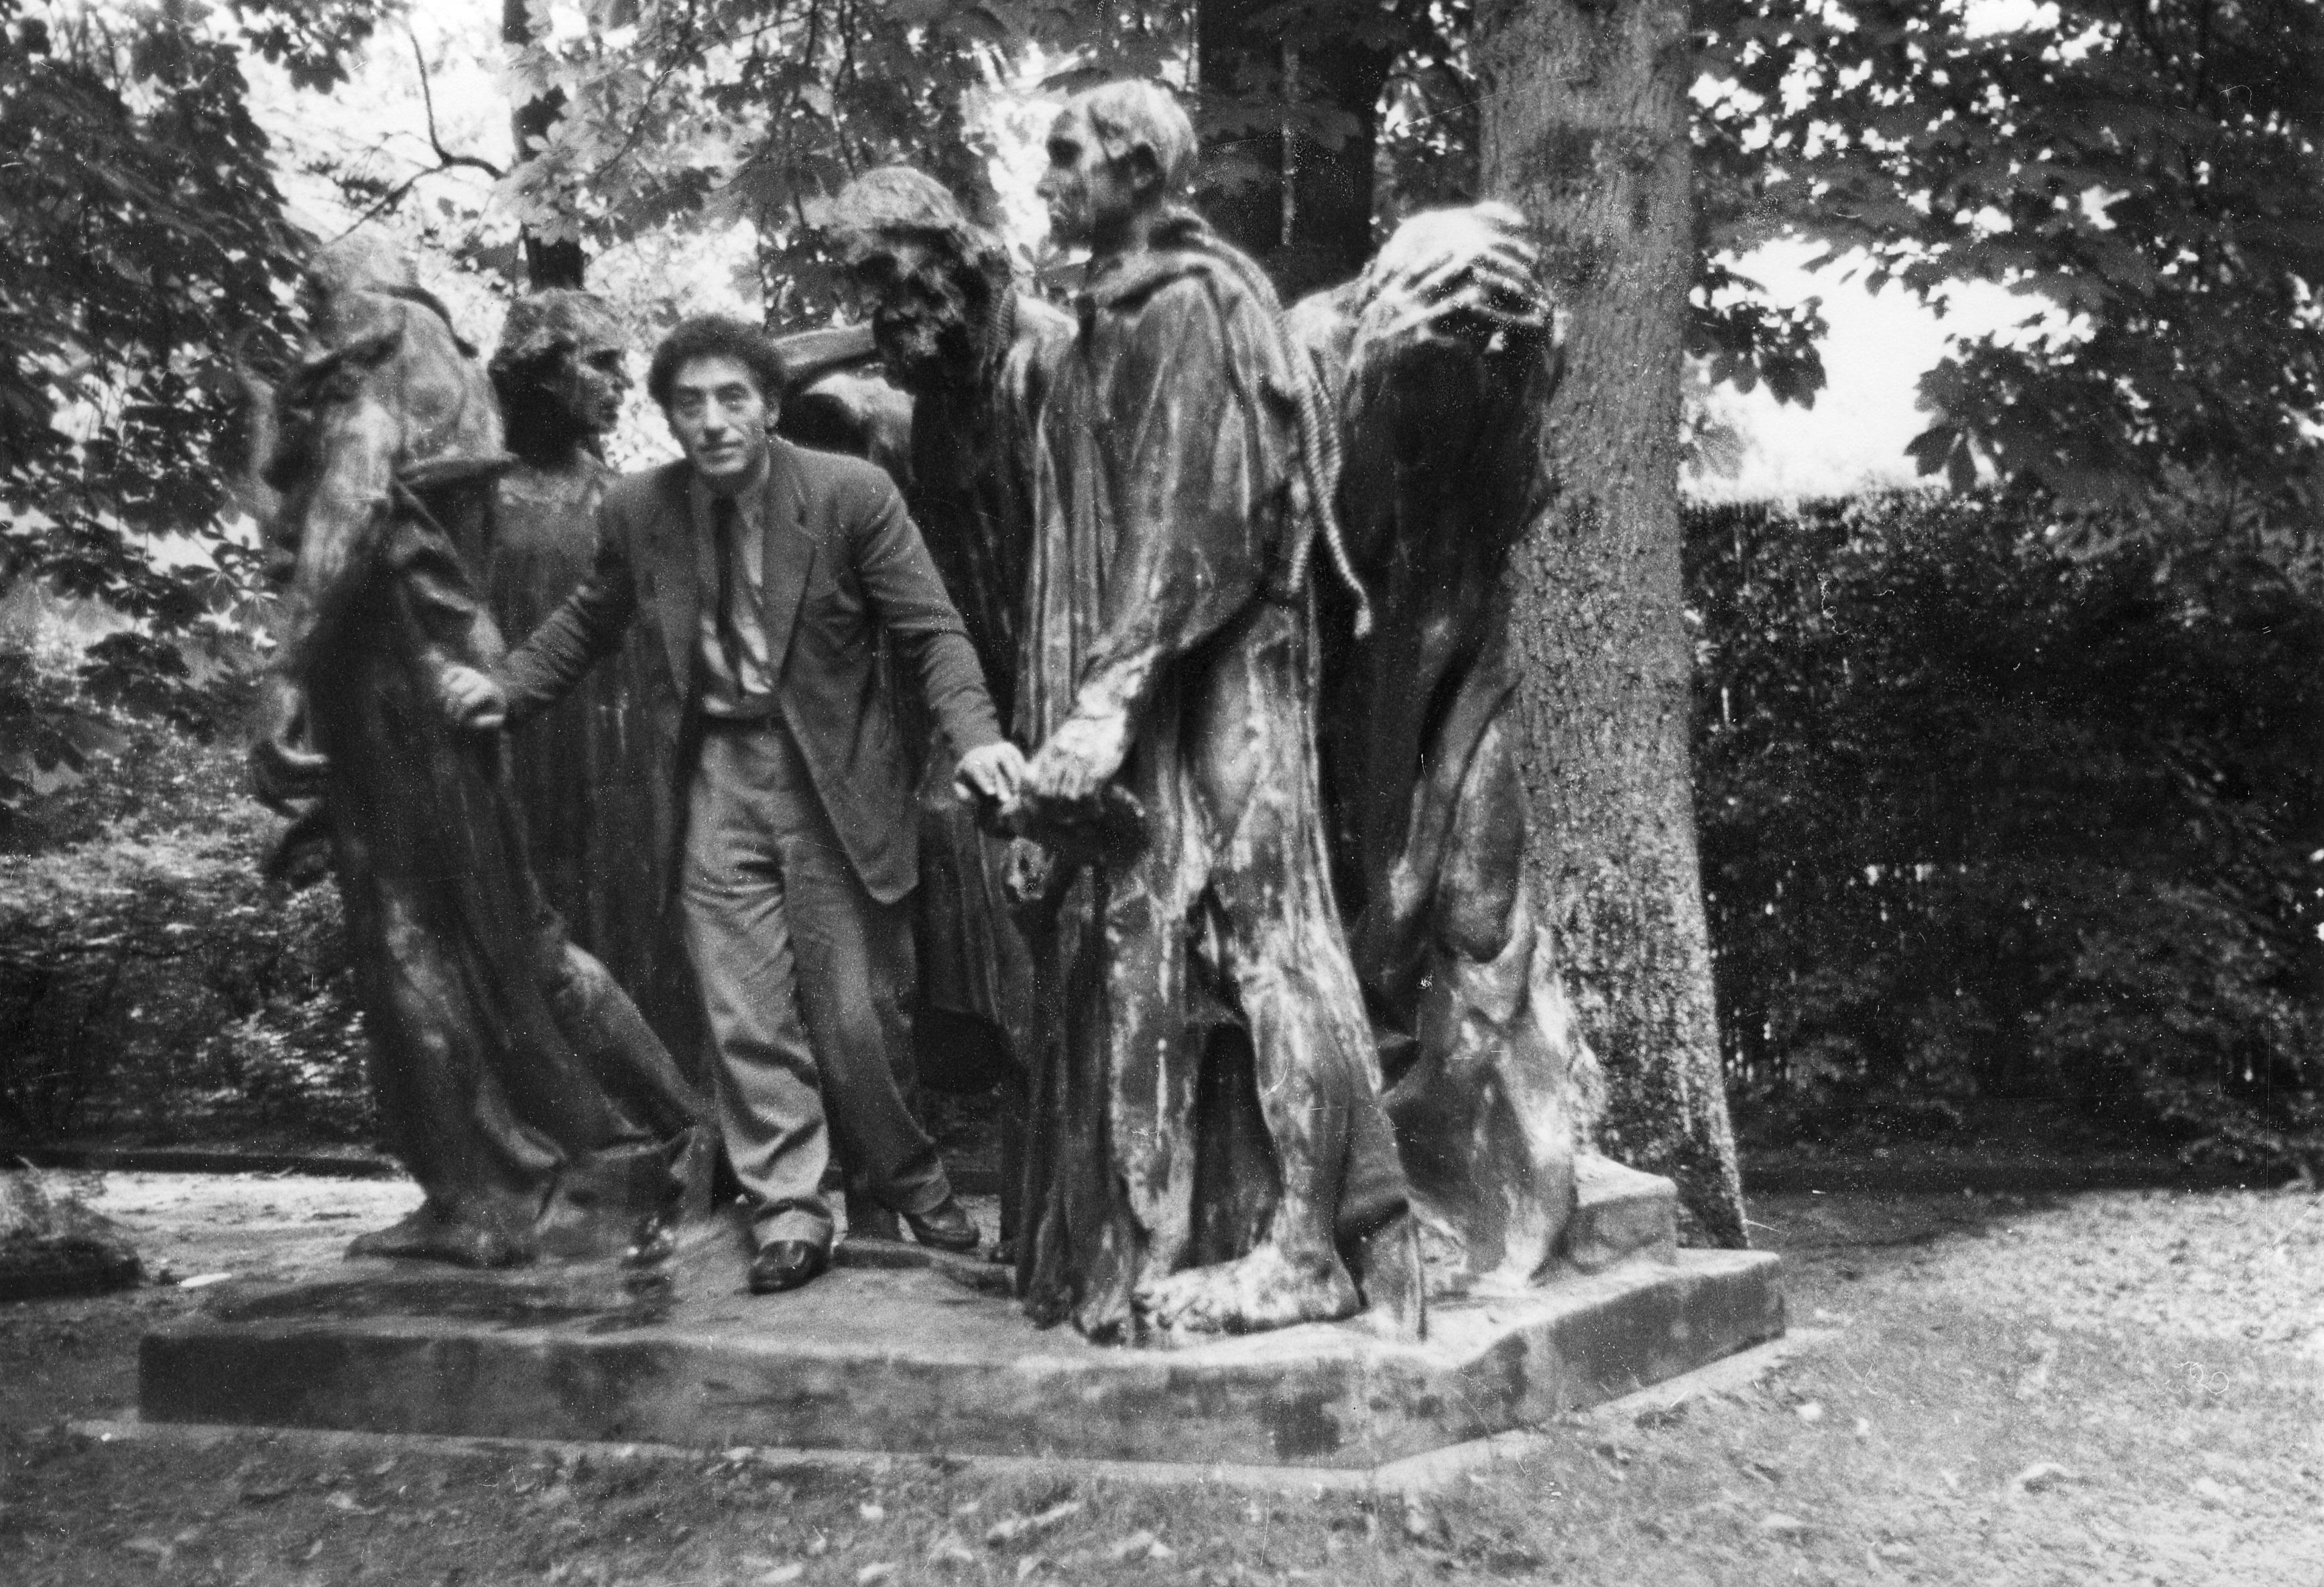 Clin d'oeil de Giacometti à Rodin